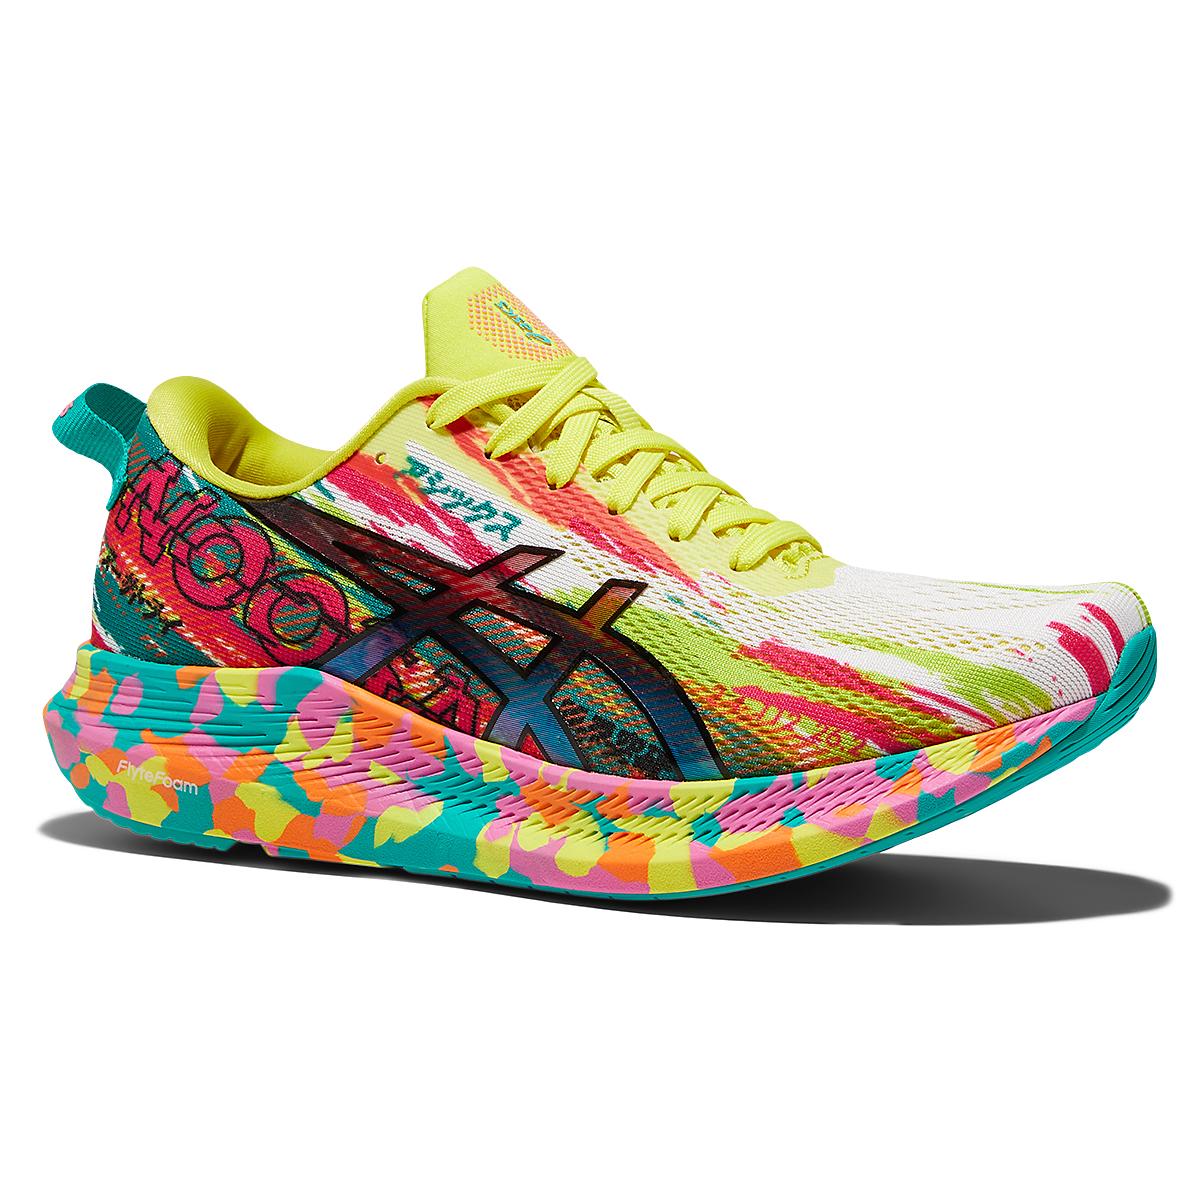 Women's Asics Noosa Tri 13 Running Shoe - Color: Hot Pink/Sour Yuzu - Size: 5 - Width: Regular, Hot Pink/Sour Yuzu, large, image 3